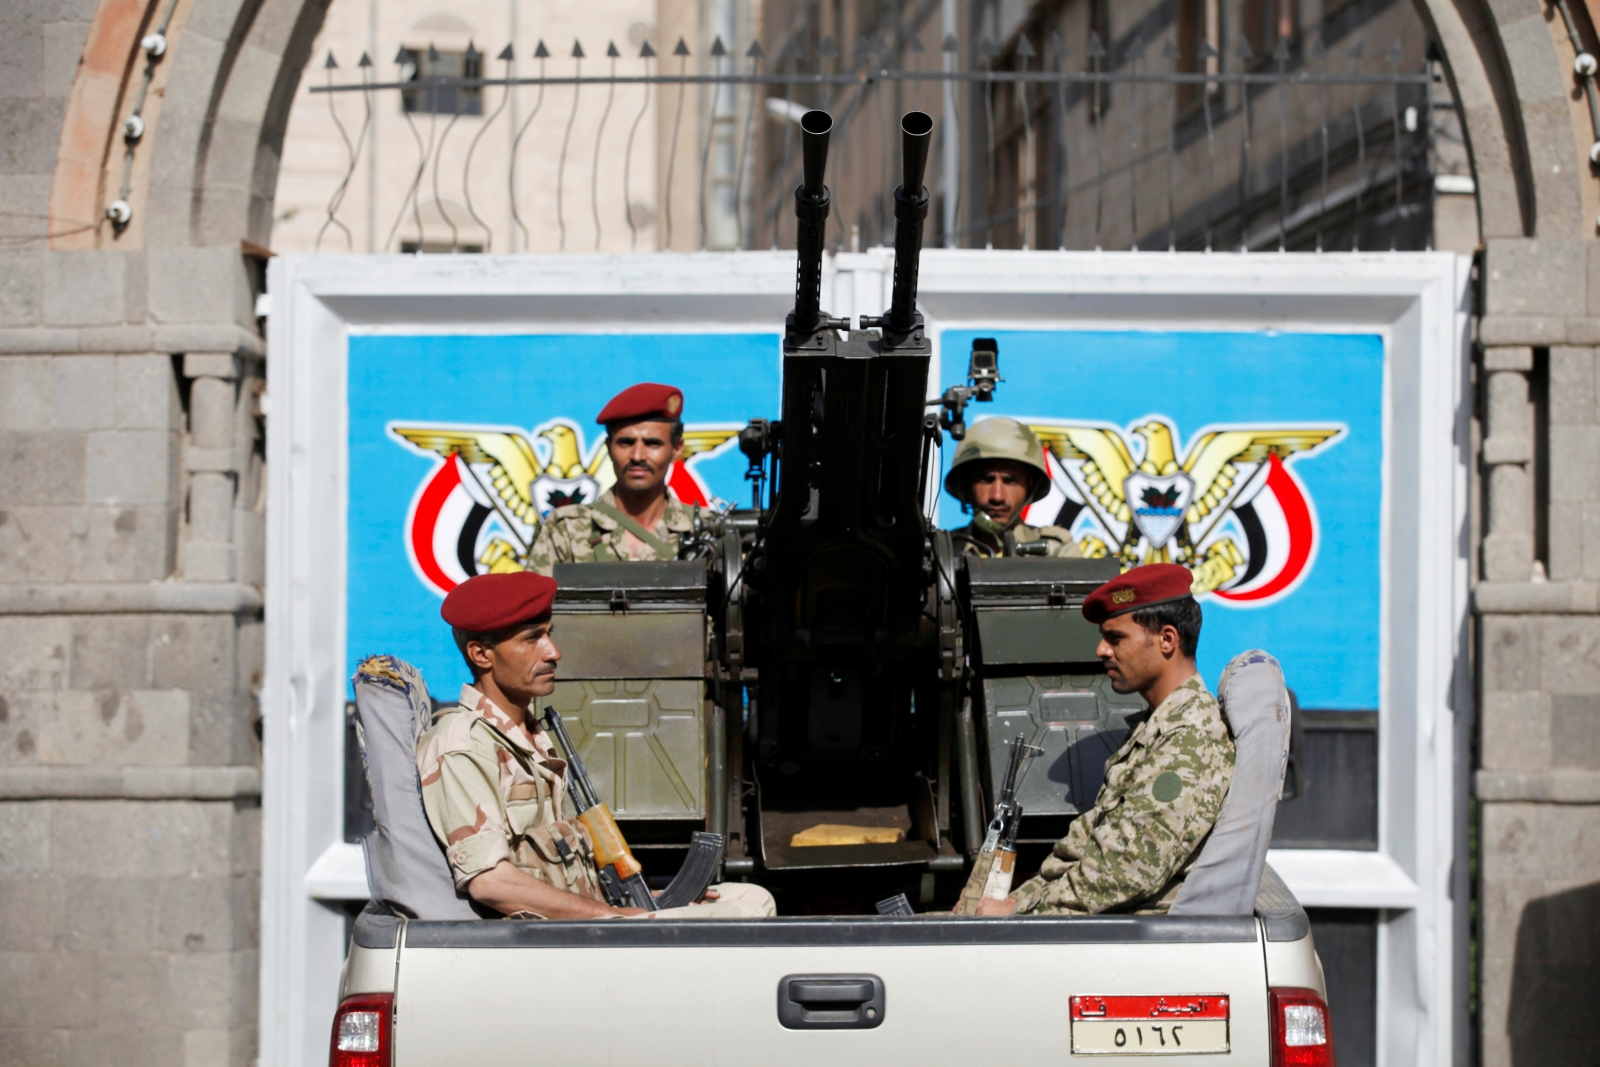 Yemen parliament security